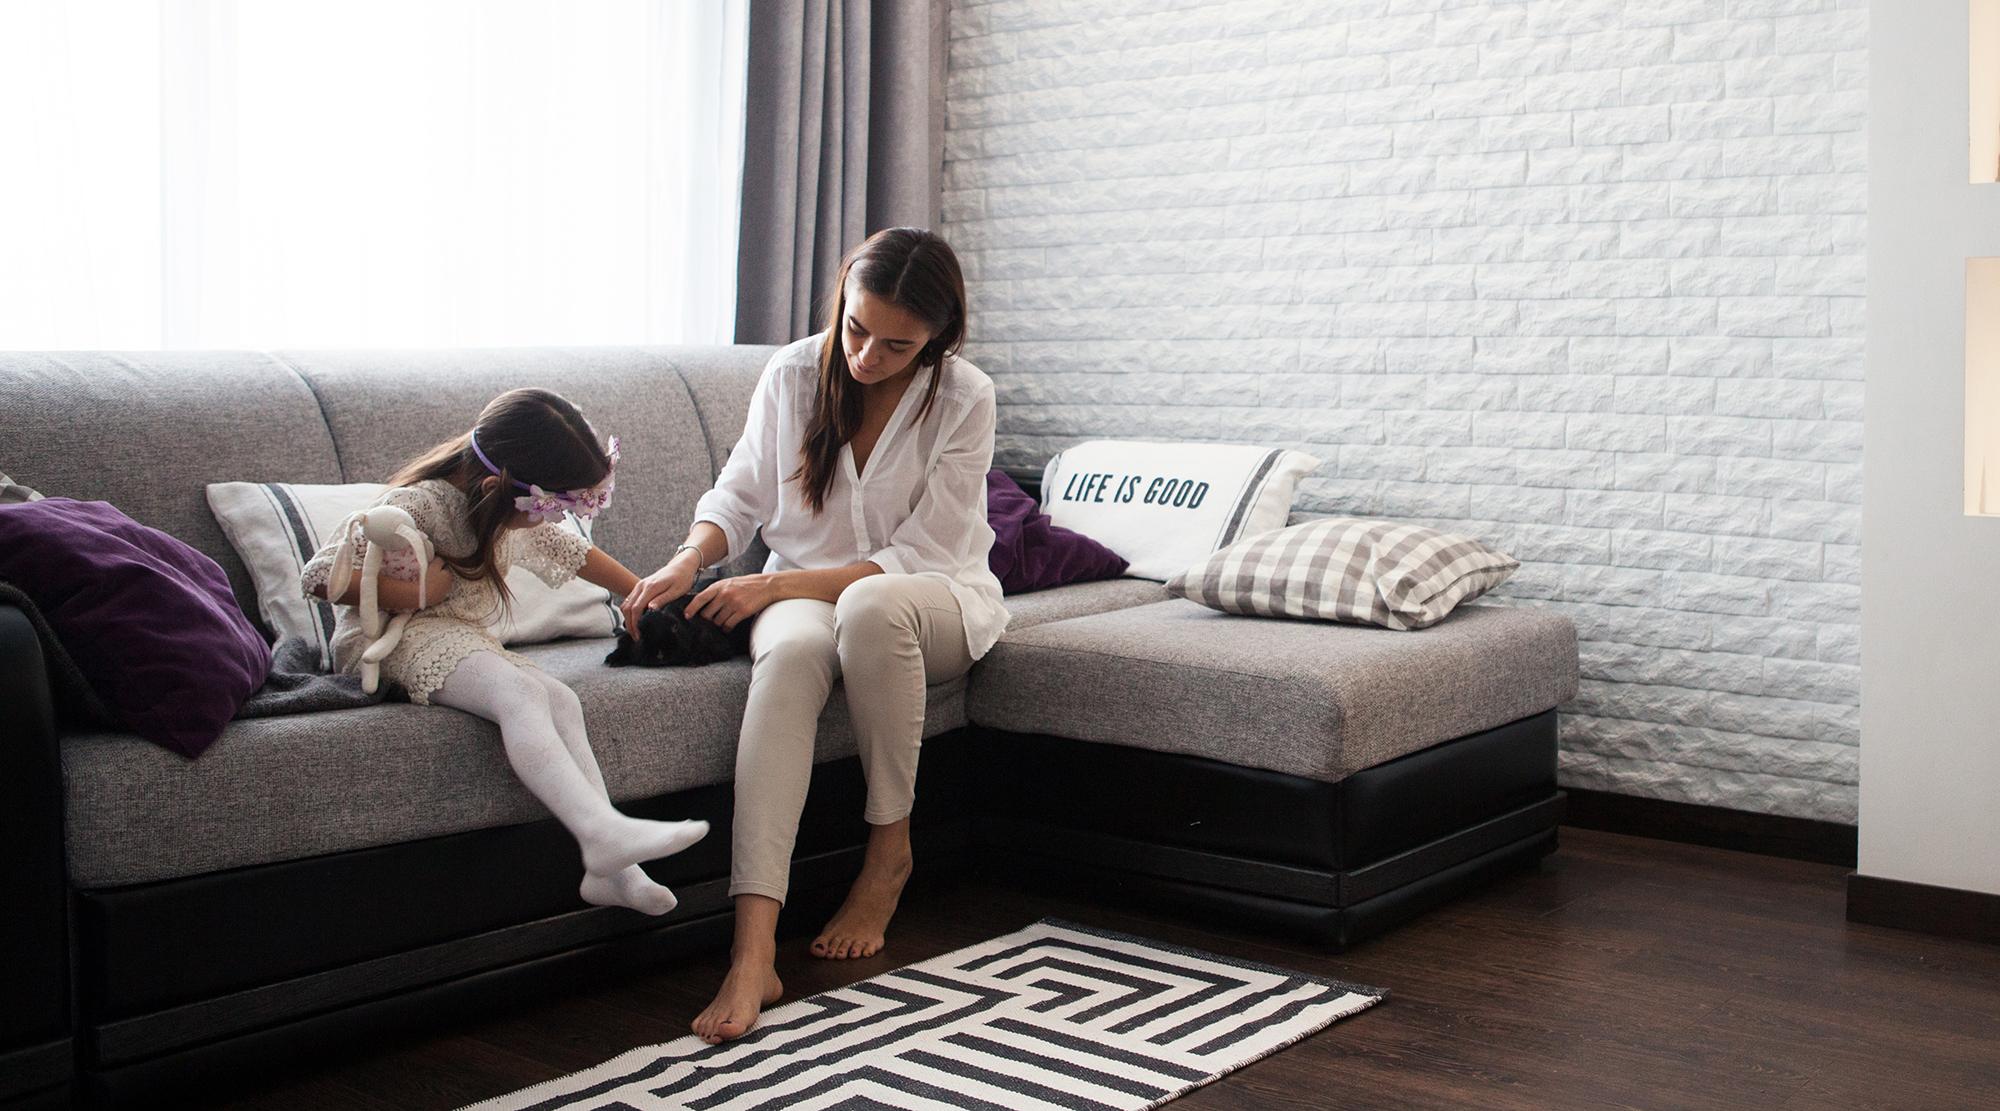 3-х комнатная квартира для молодой семьи